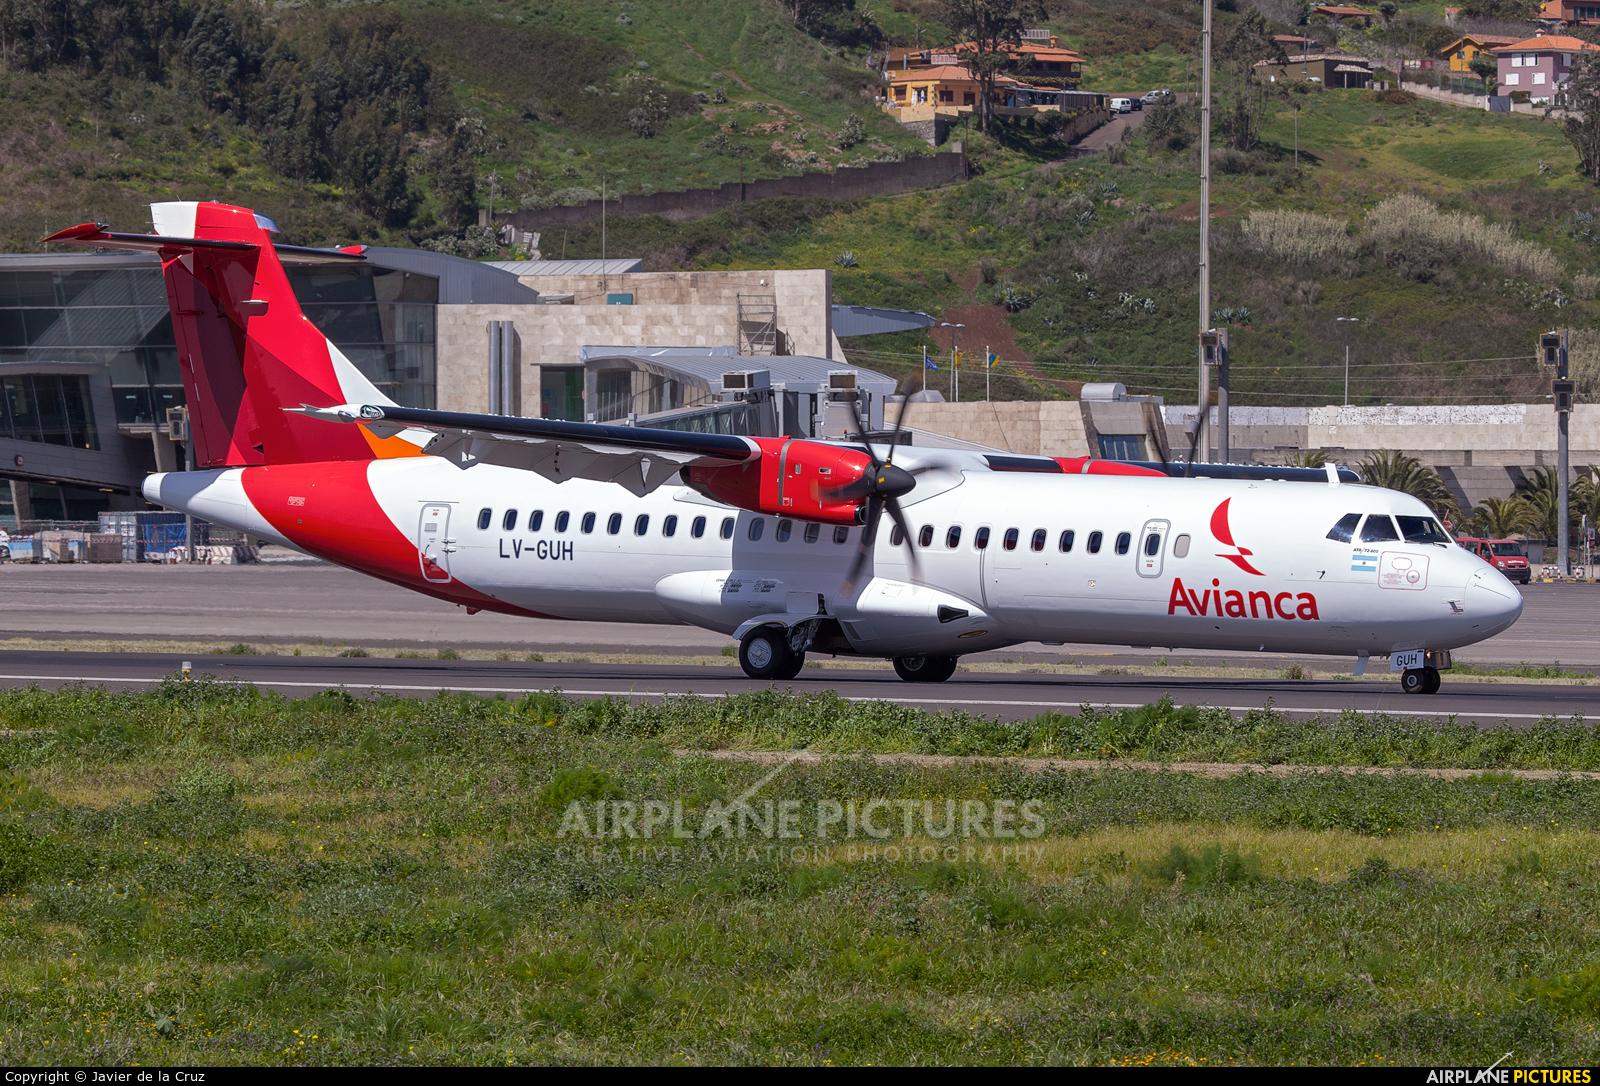 Avianca Argentina LV-GUH aircraft at Tenerife Norte - Los Rodeos